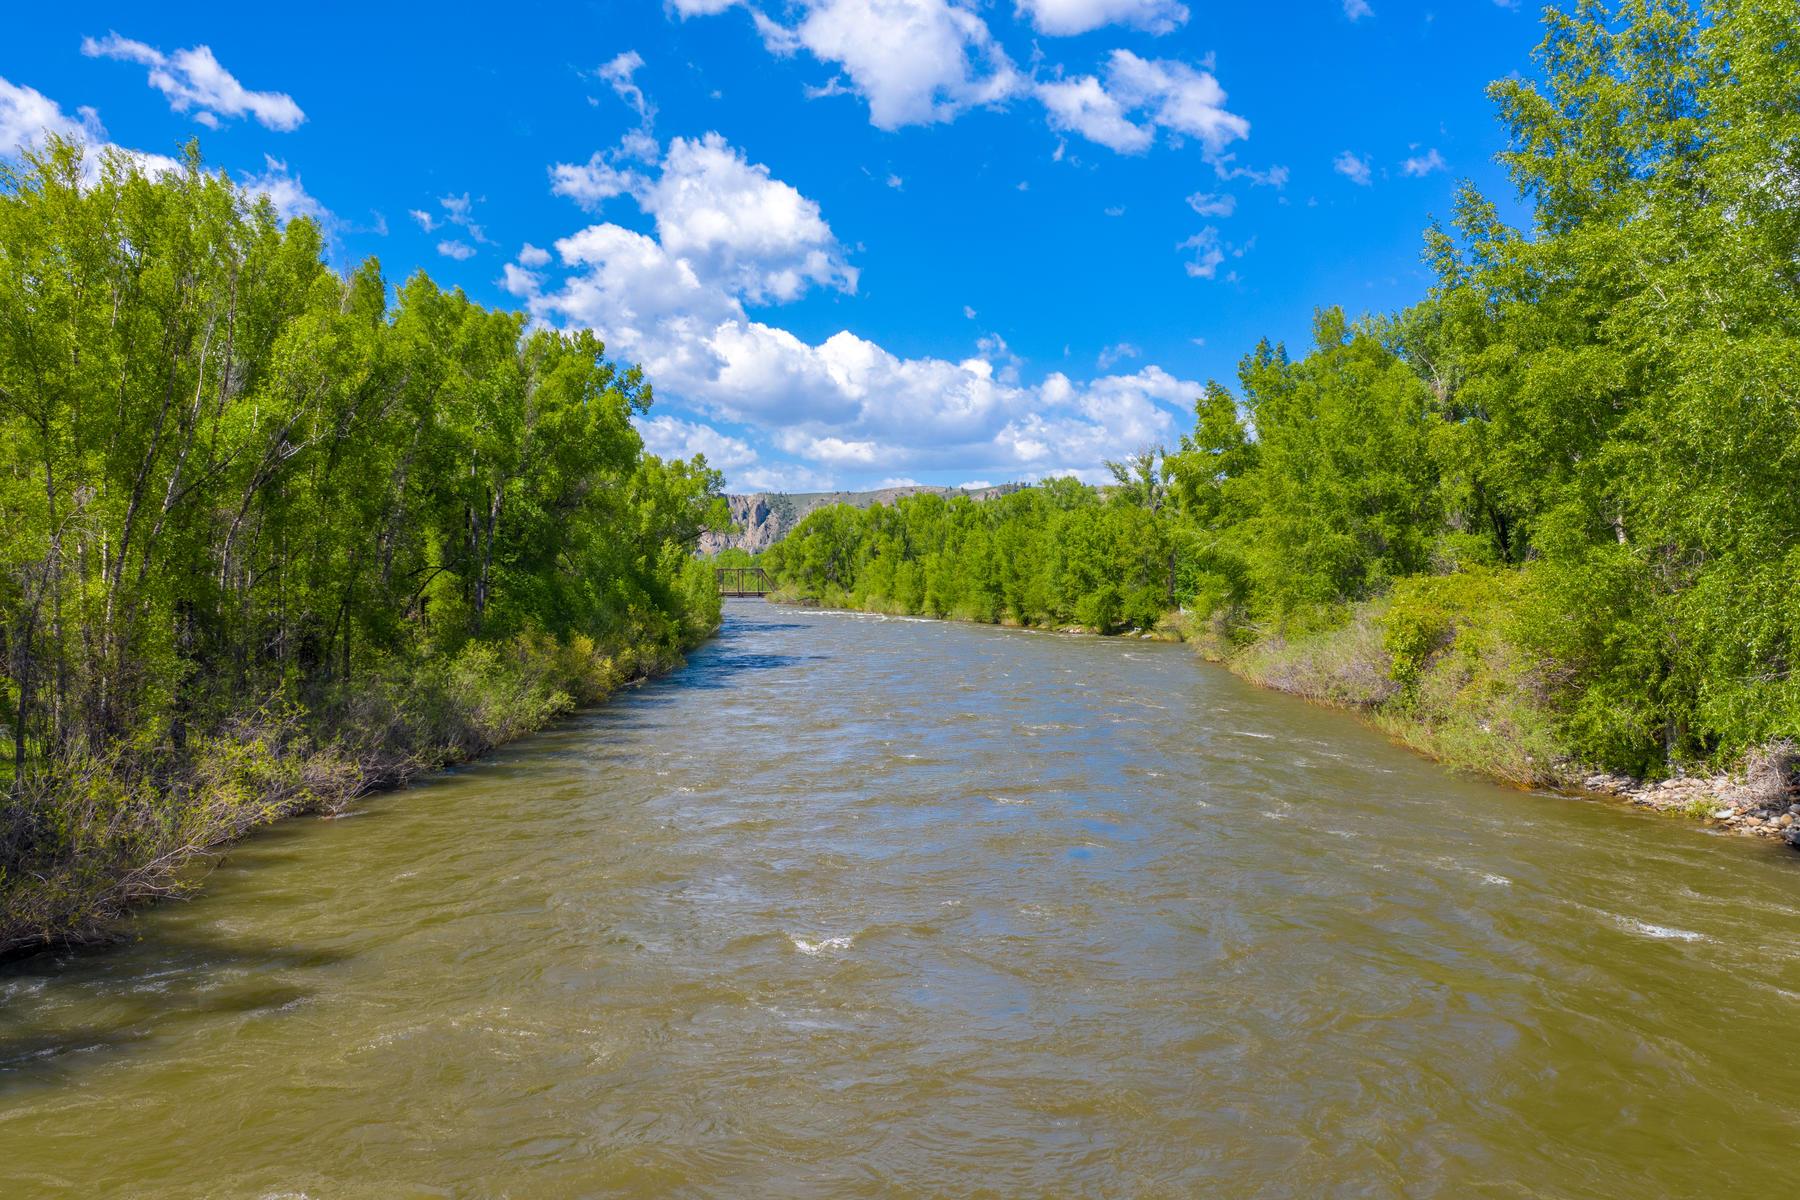 Terreno para Venda às Gunnison Riverfront Property 85 Riverwalk Drive, Gunnison, Colorado 81230 Estados Unidos